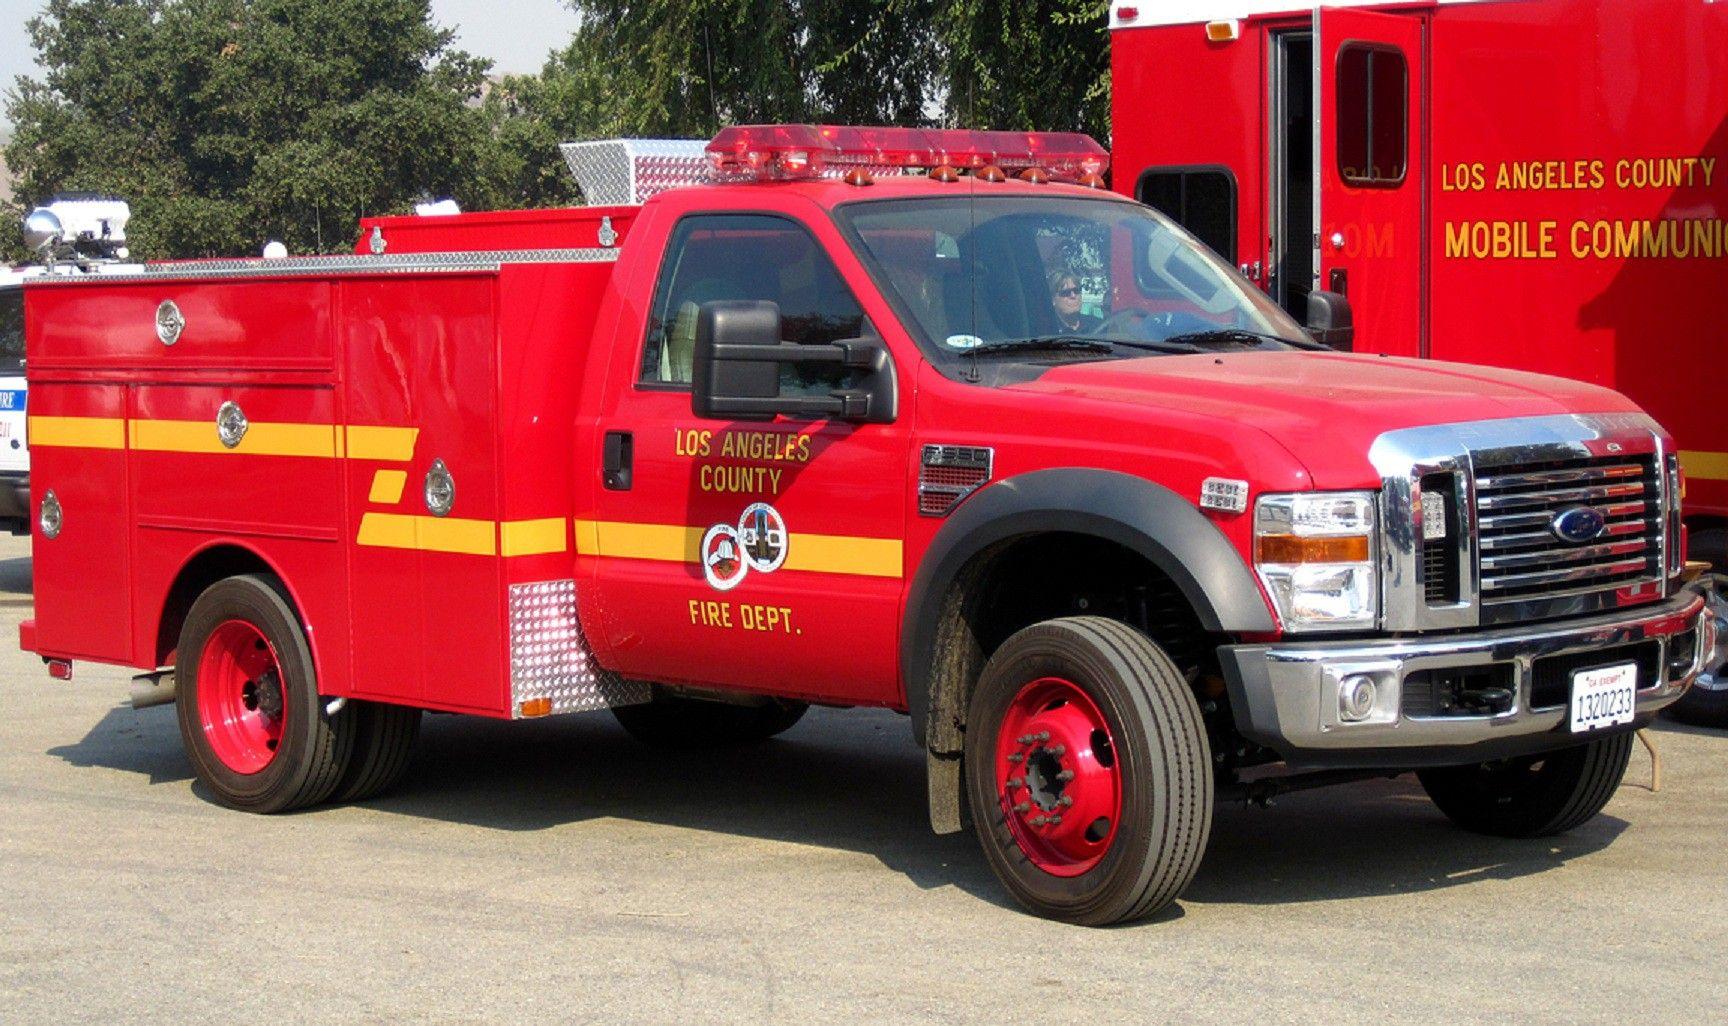 Pin By Firelife On Fd La County Fire Dept Fire Service Emergency Vehicles Fire Trucks